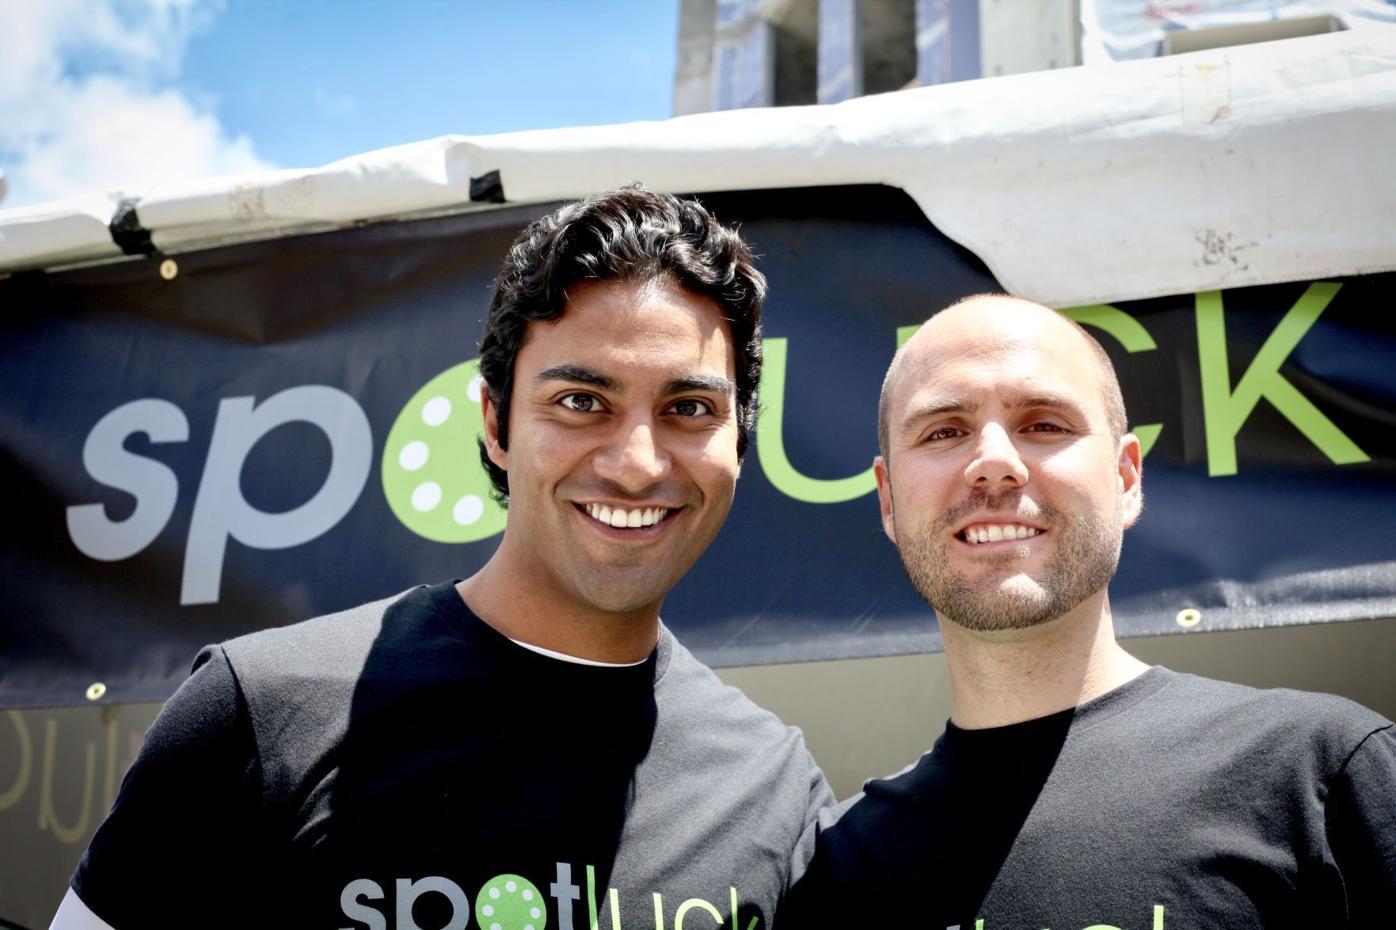 Spotluck launch